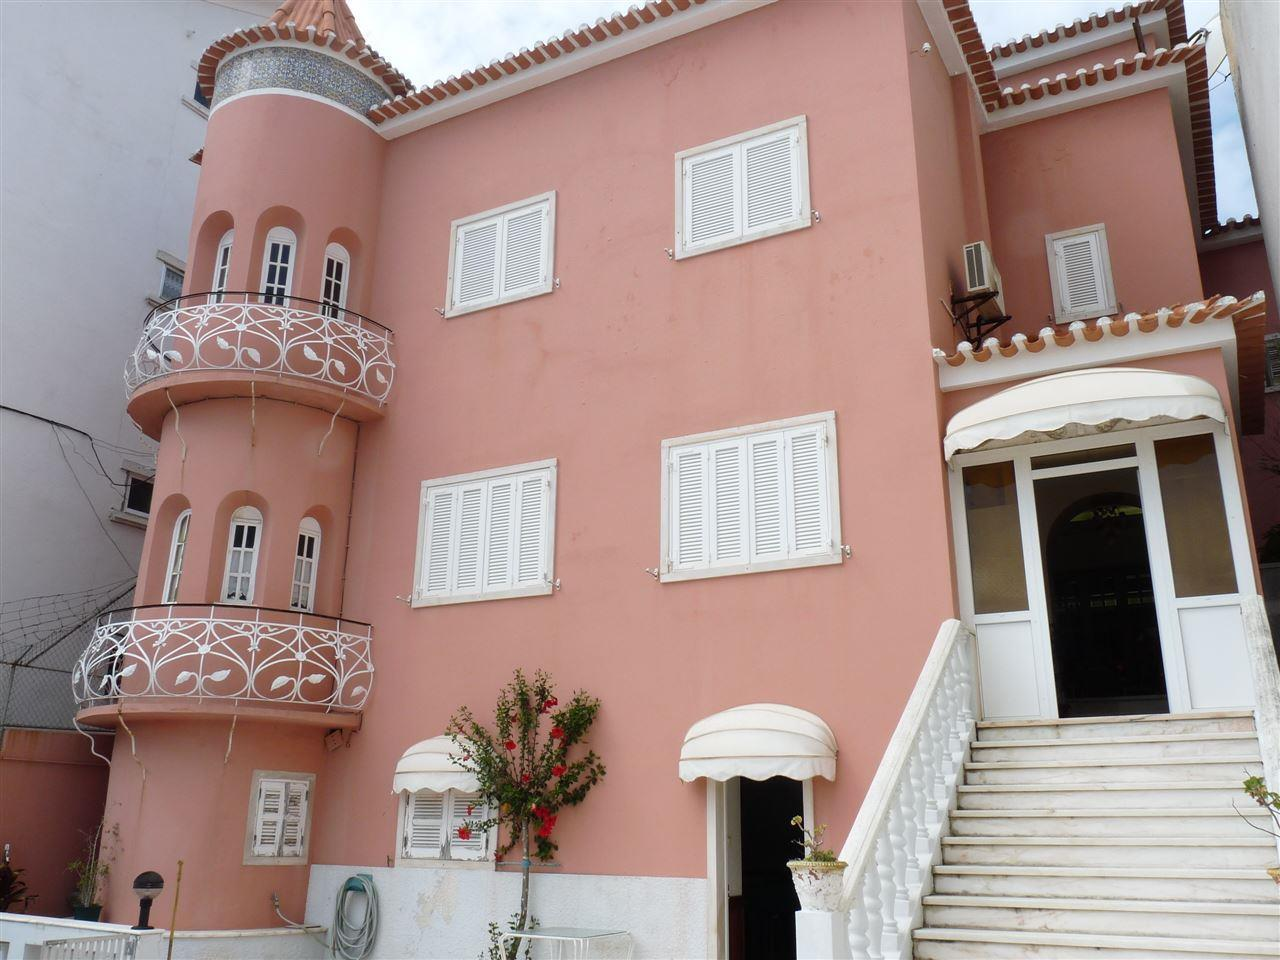 独户住宅 为 销售 在 Terraced house, 4 bedrooms, for Sale Alto Sta Catarina, Oeiras, 葡京 葡萄牙